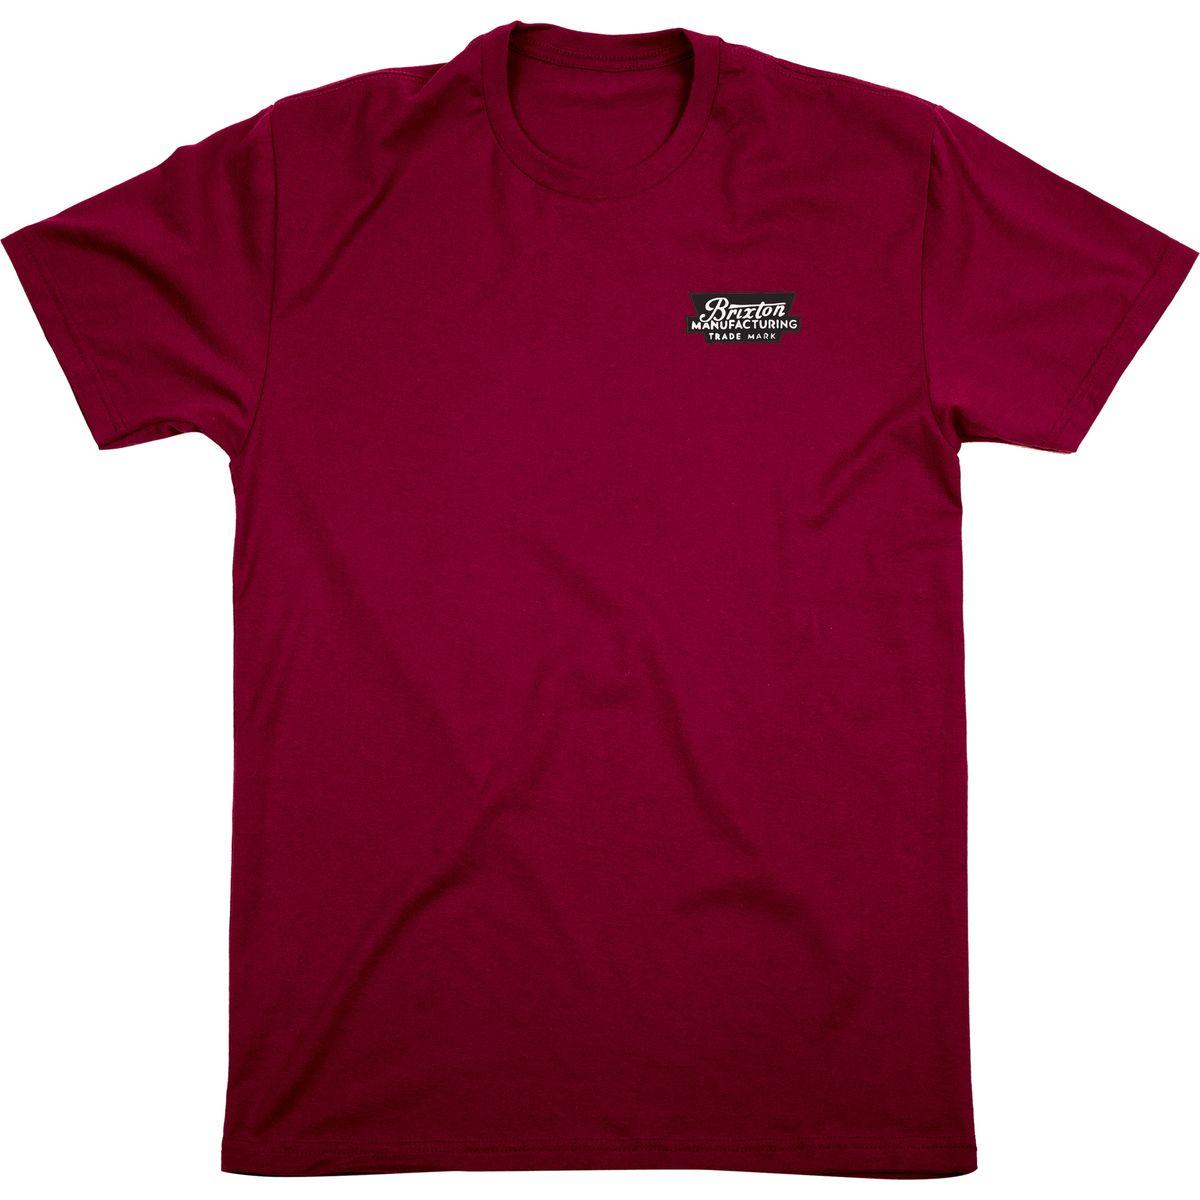 Brixton Plymouth T-Shirt - Men